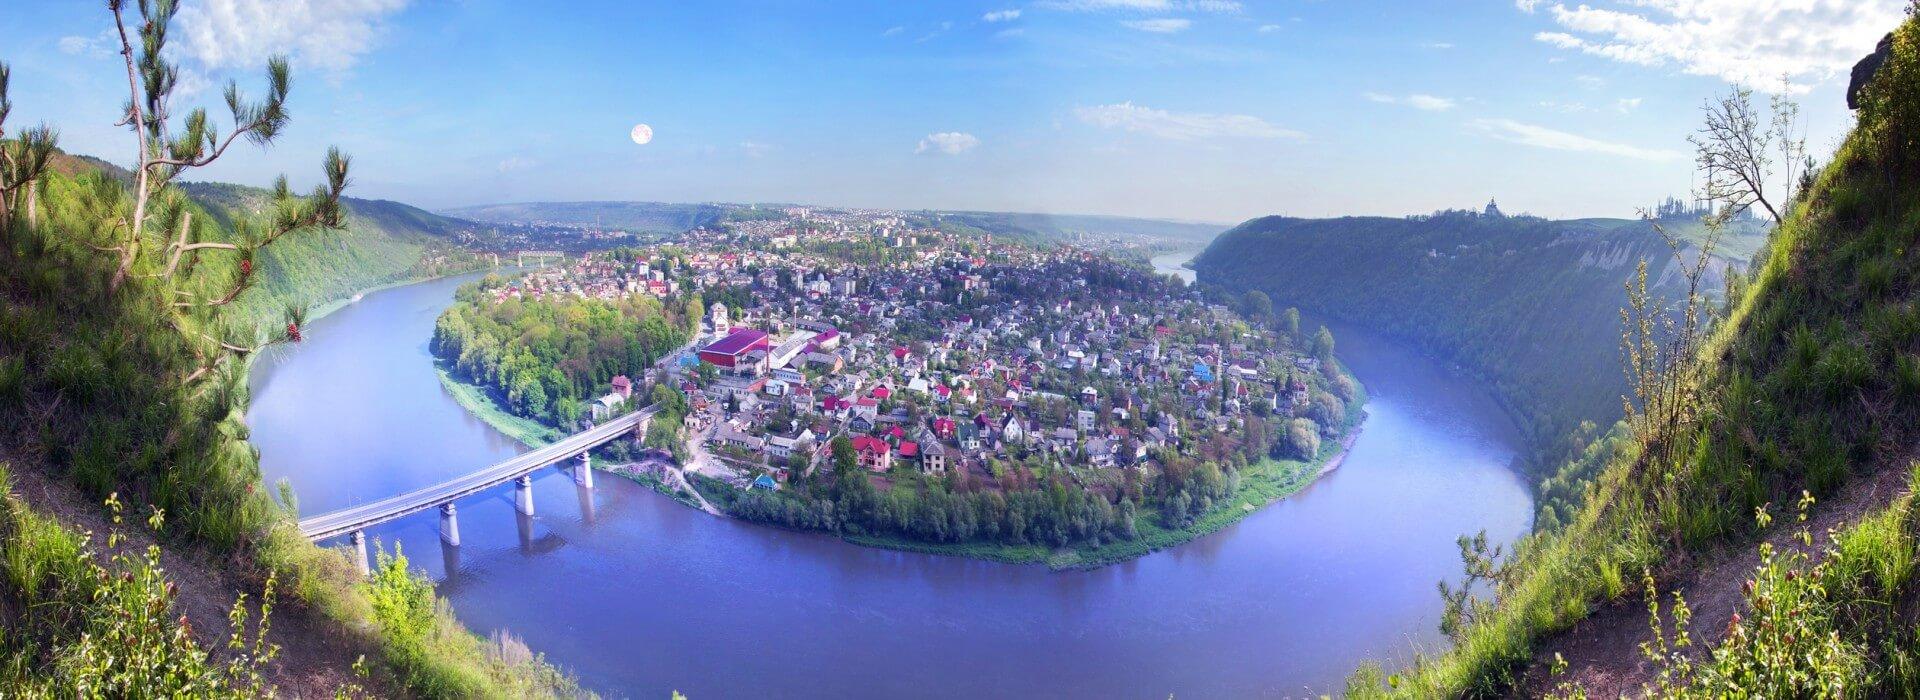 moldova citizenship by investment program